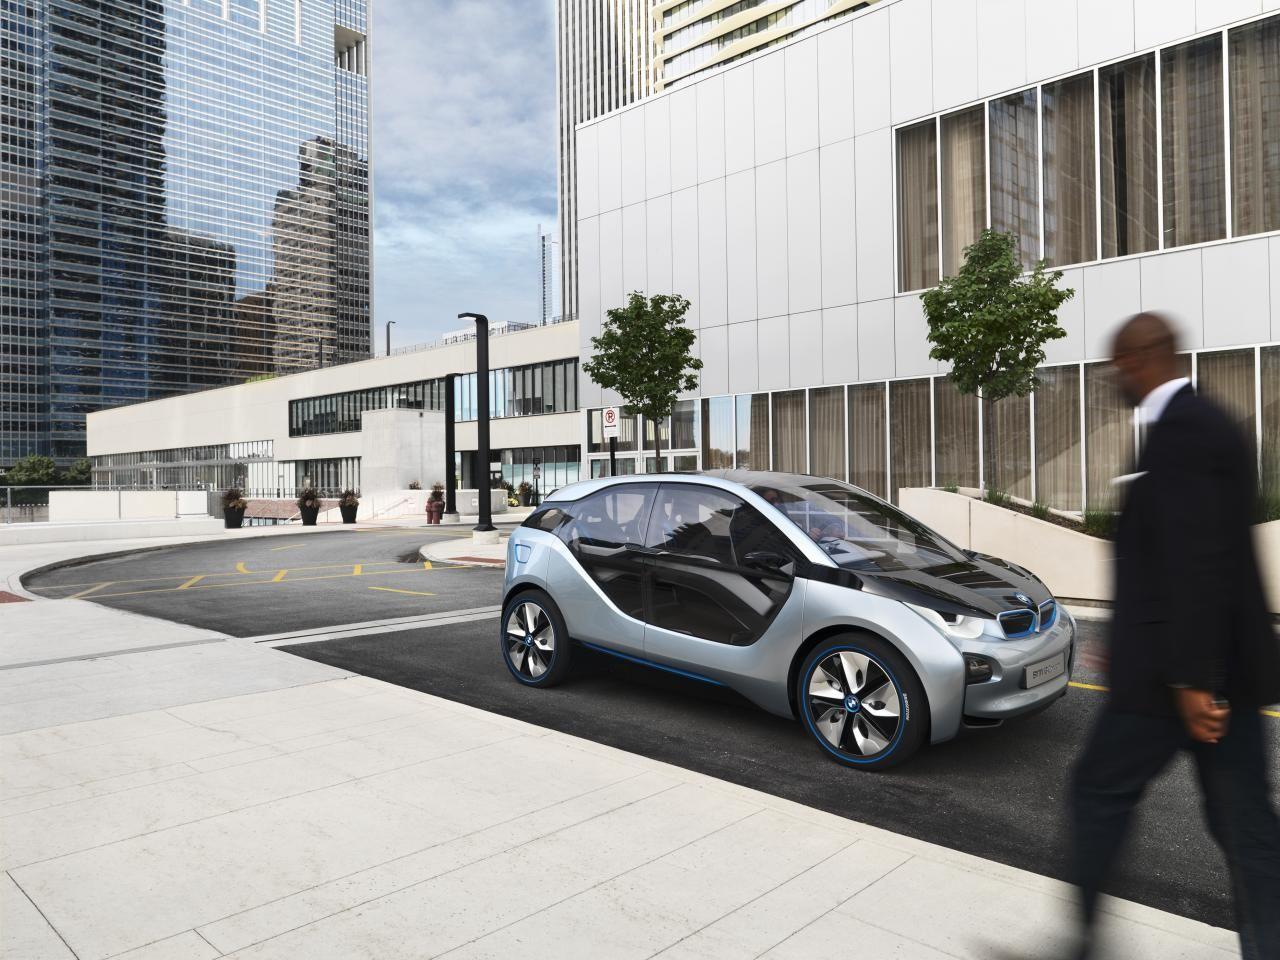 2011 BMW i3 Concept   Bold BMW Concept Cars   Pinterest   Bmw i3 ...